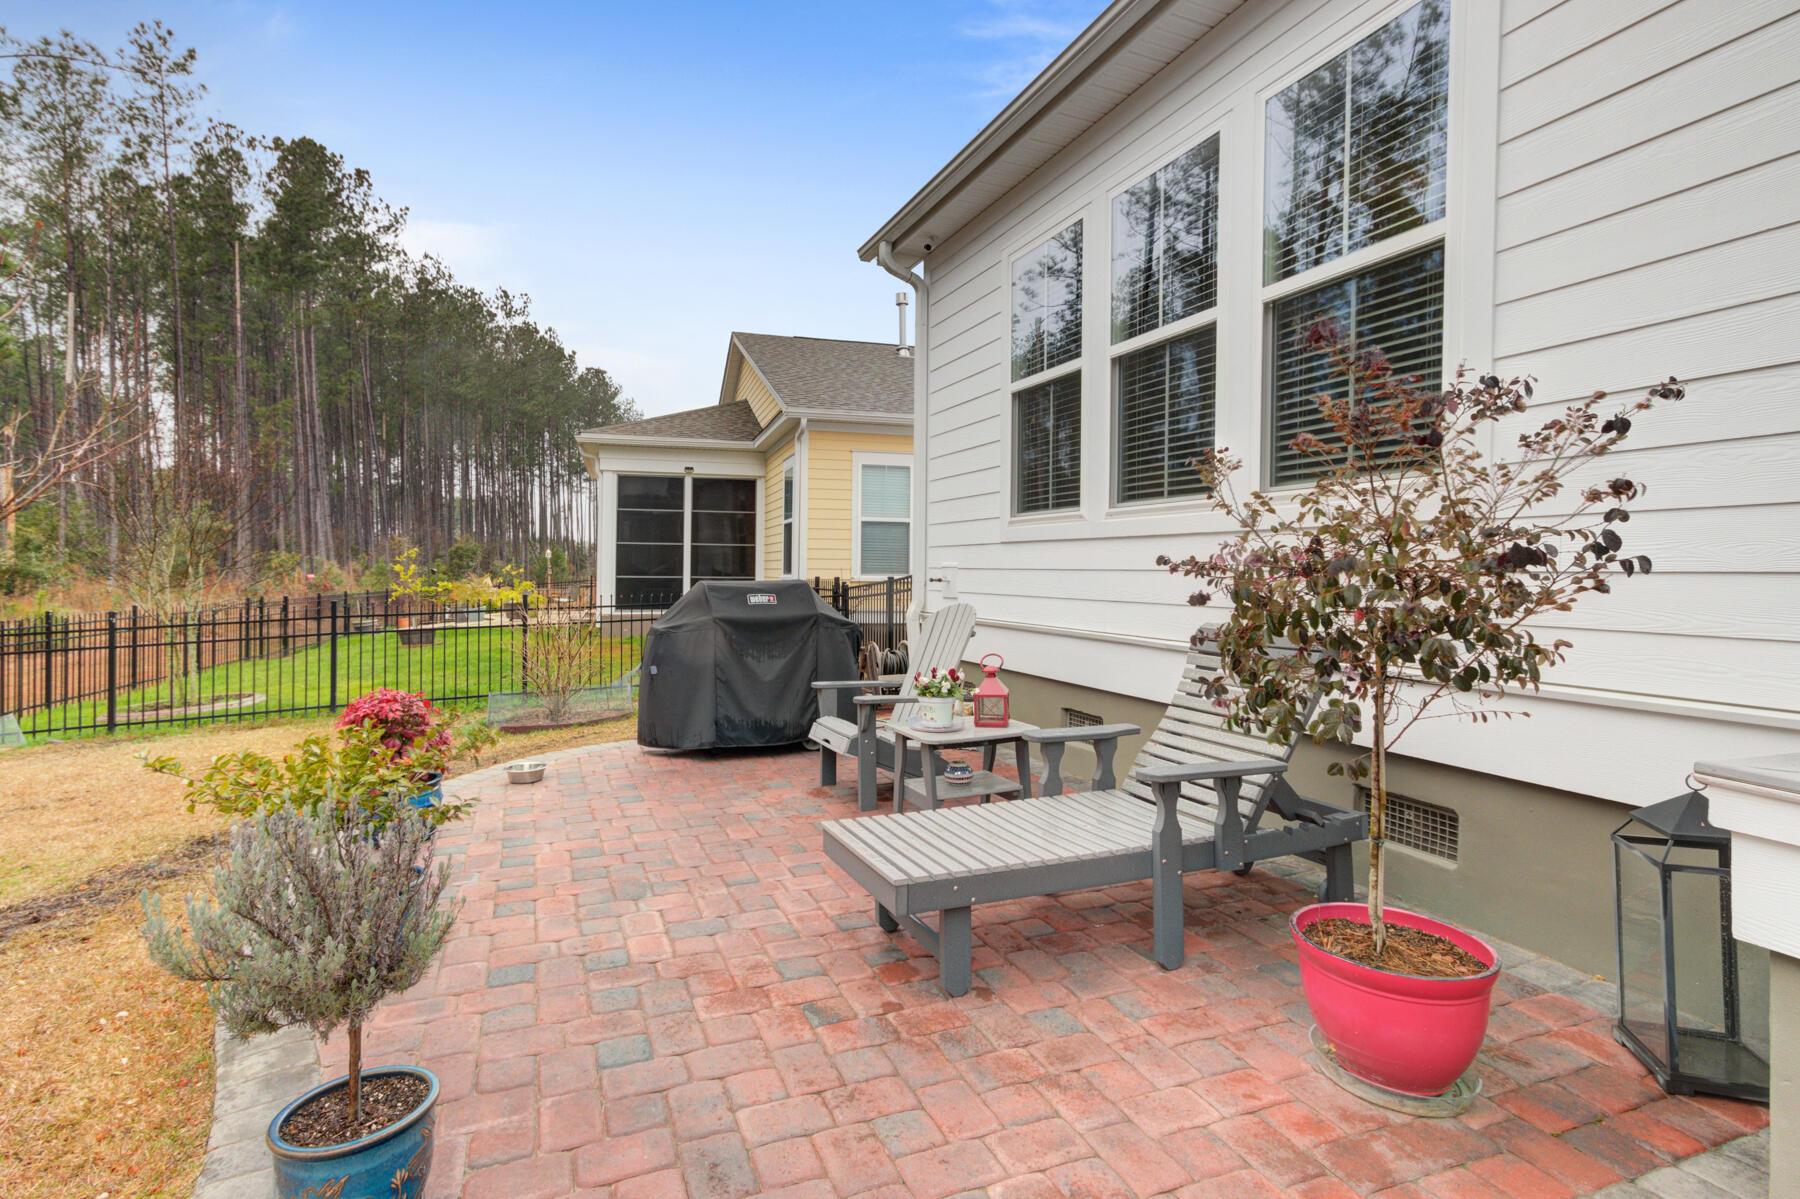 Cane Bay Plantation Homes For Sale - 251 Calm Water, Summerville, SC - 13